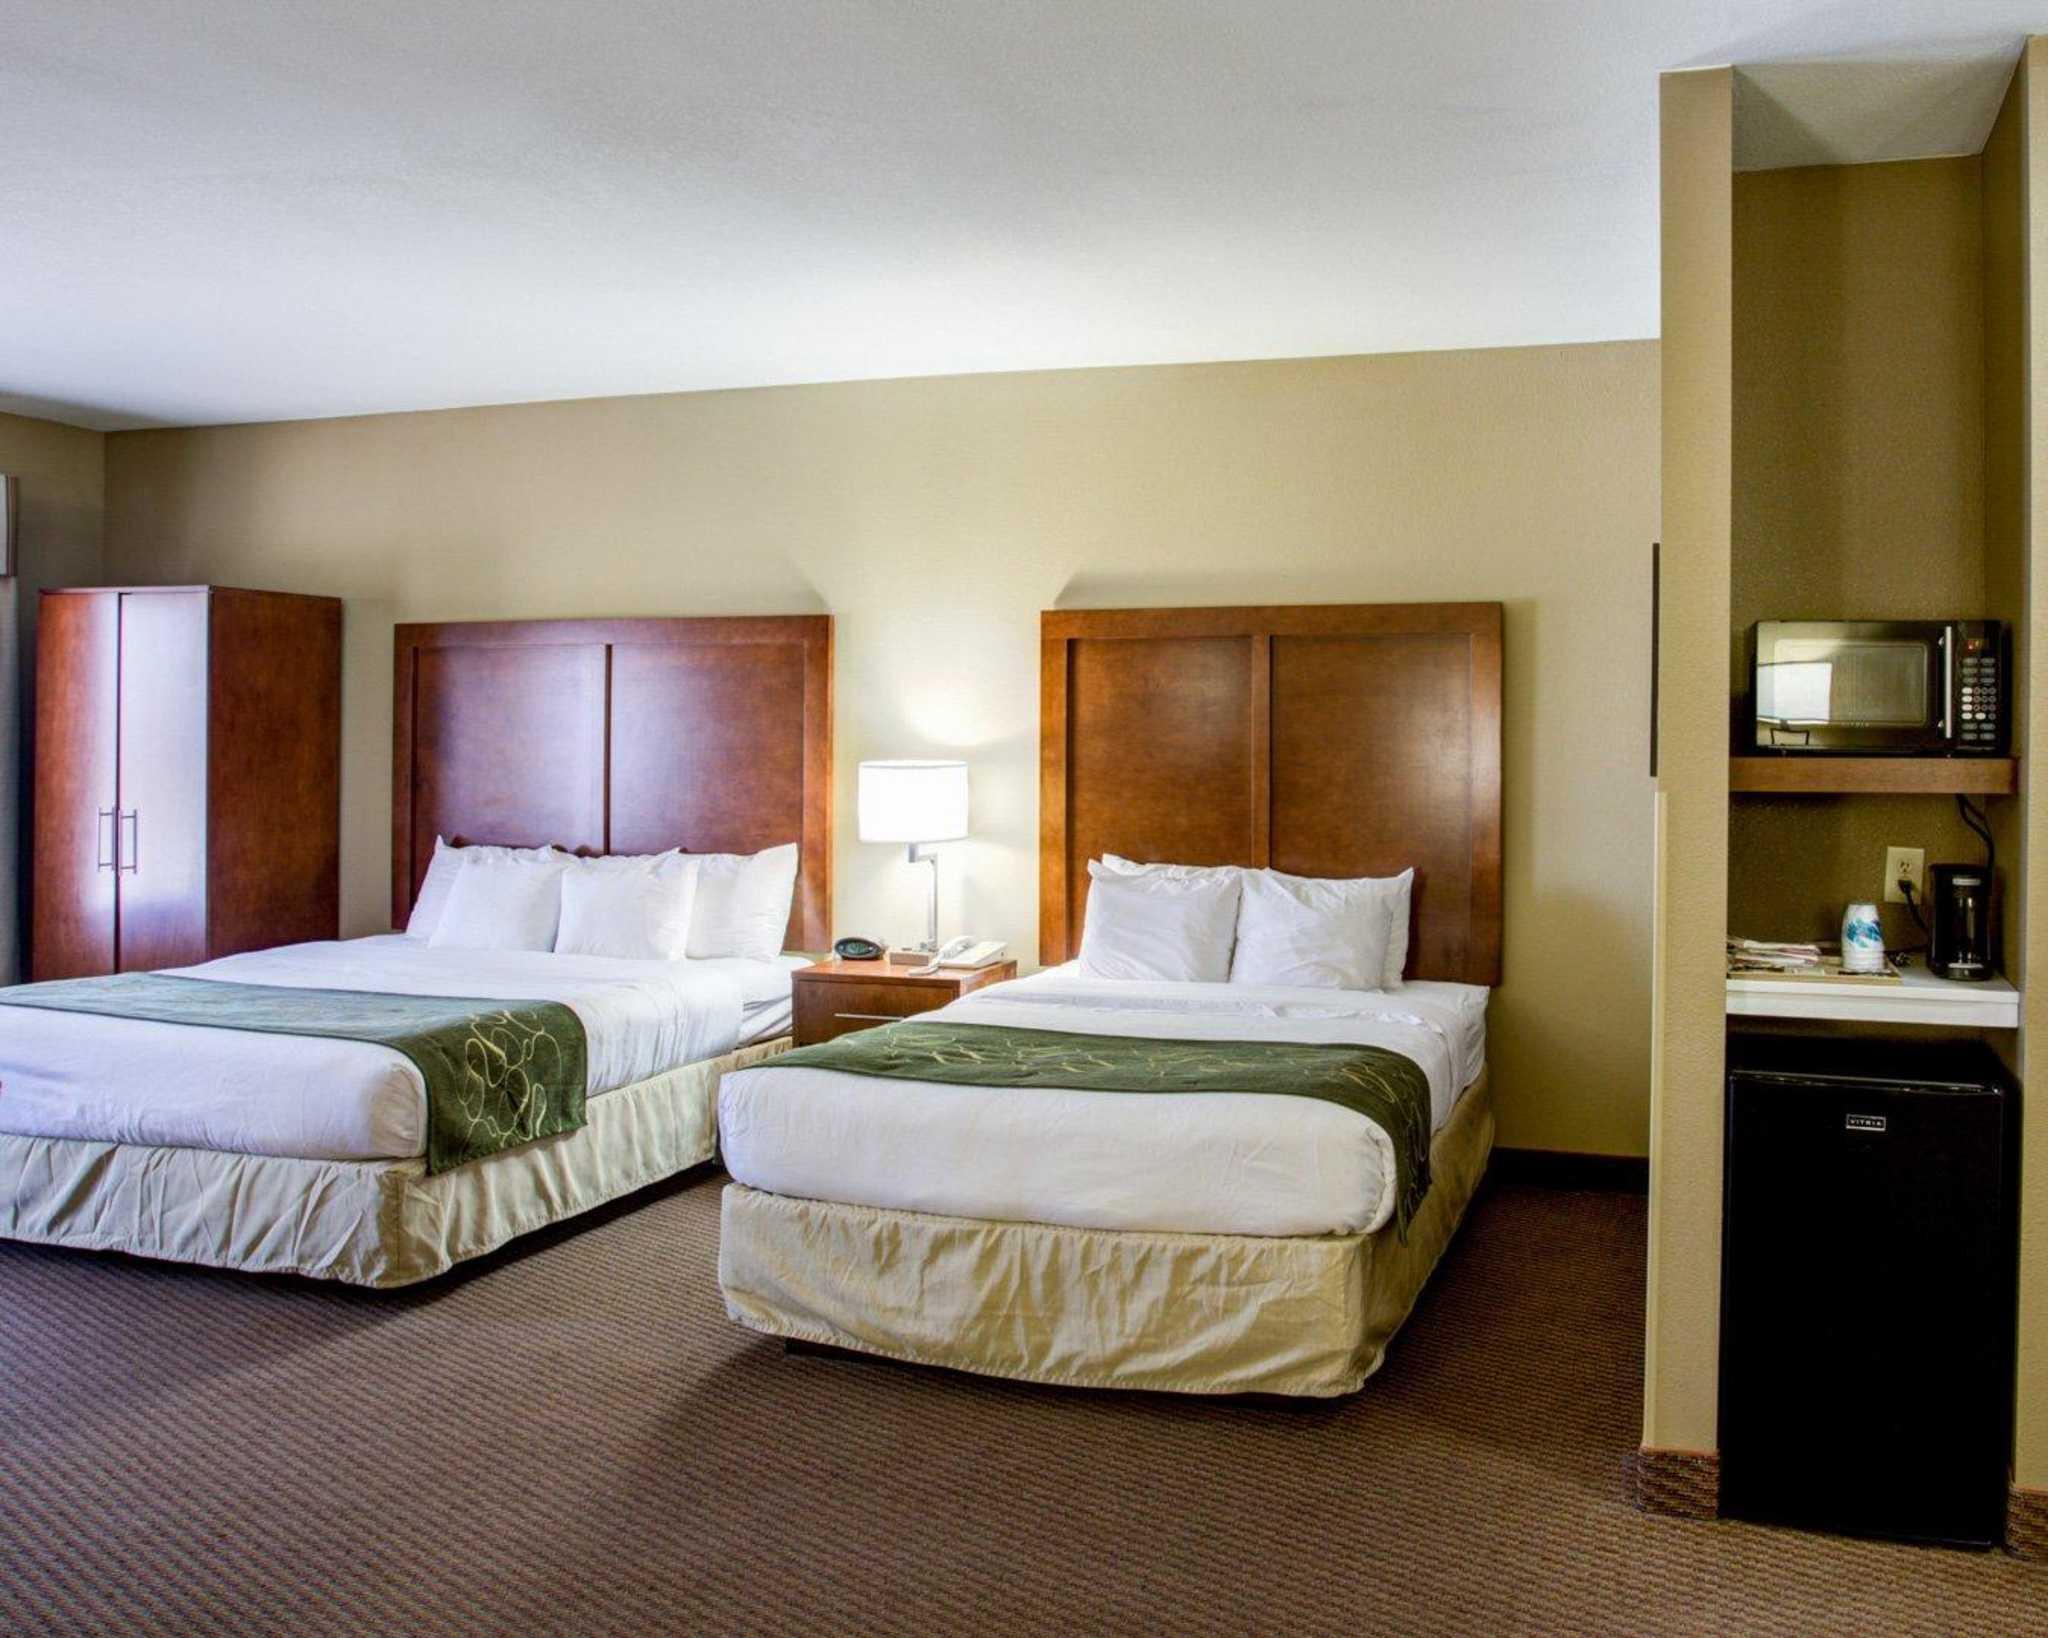 Comfort Suites image 16